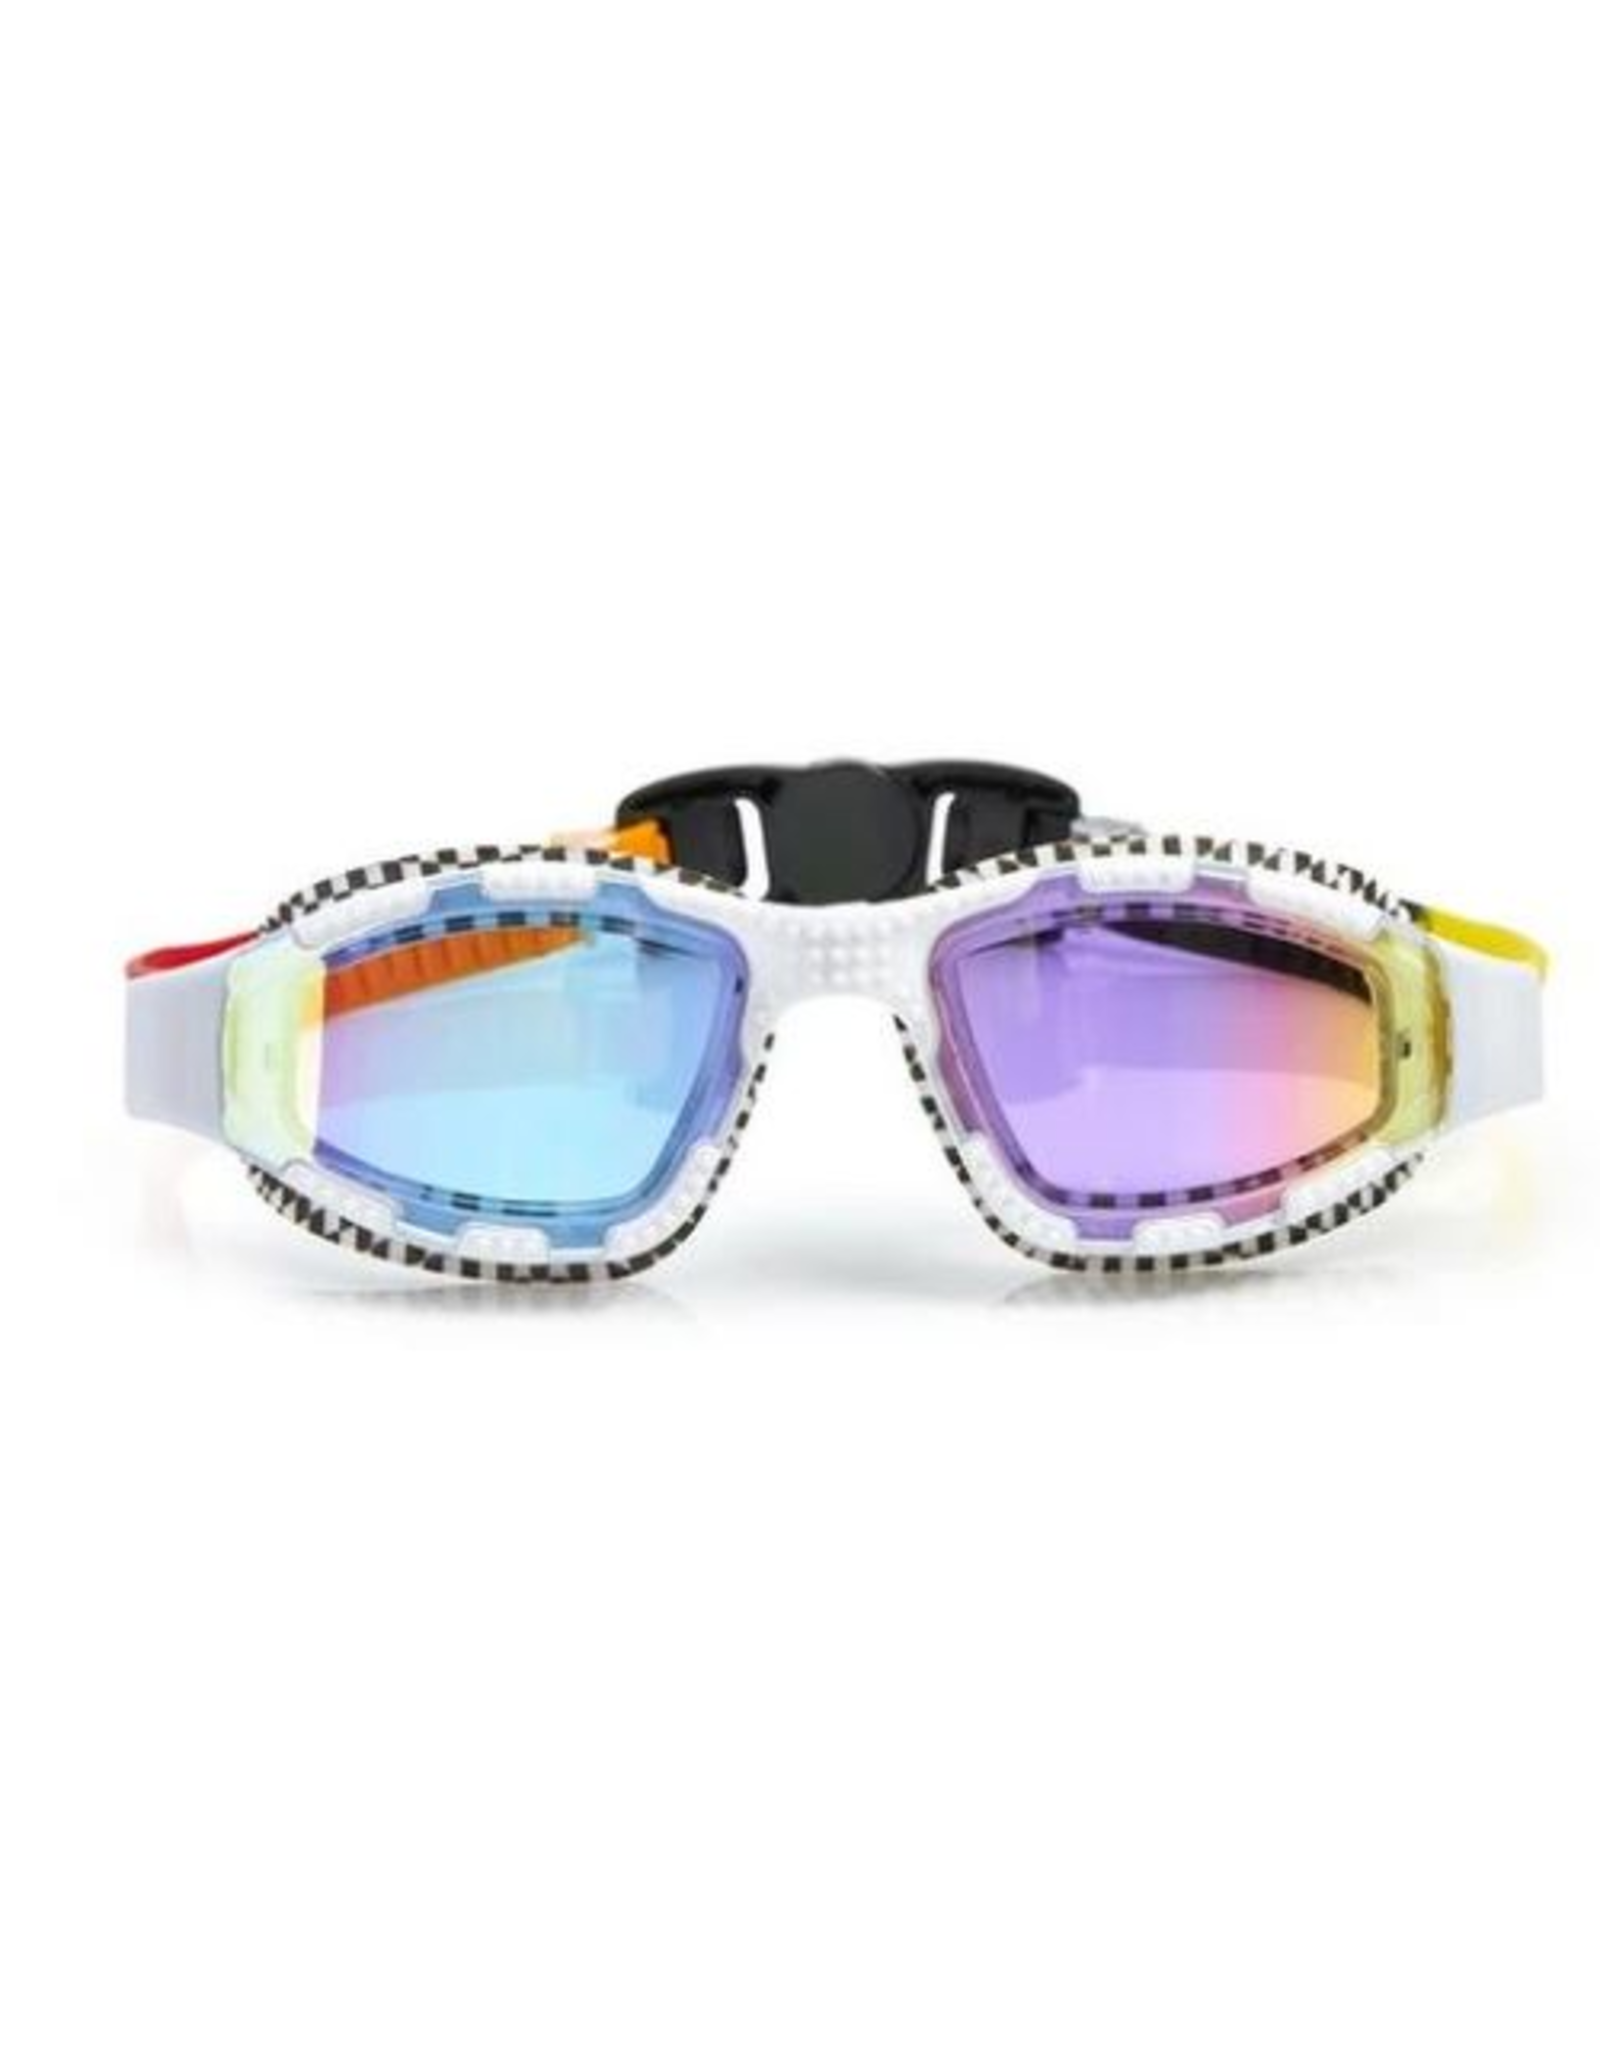 Bling20 Goggles Street Vibe 6yrs+